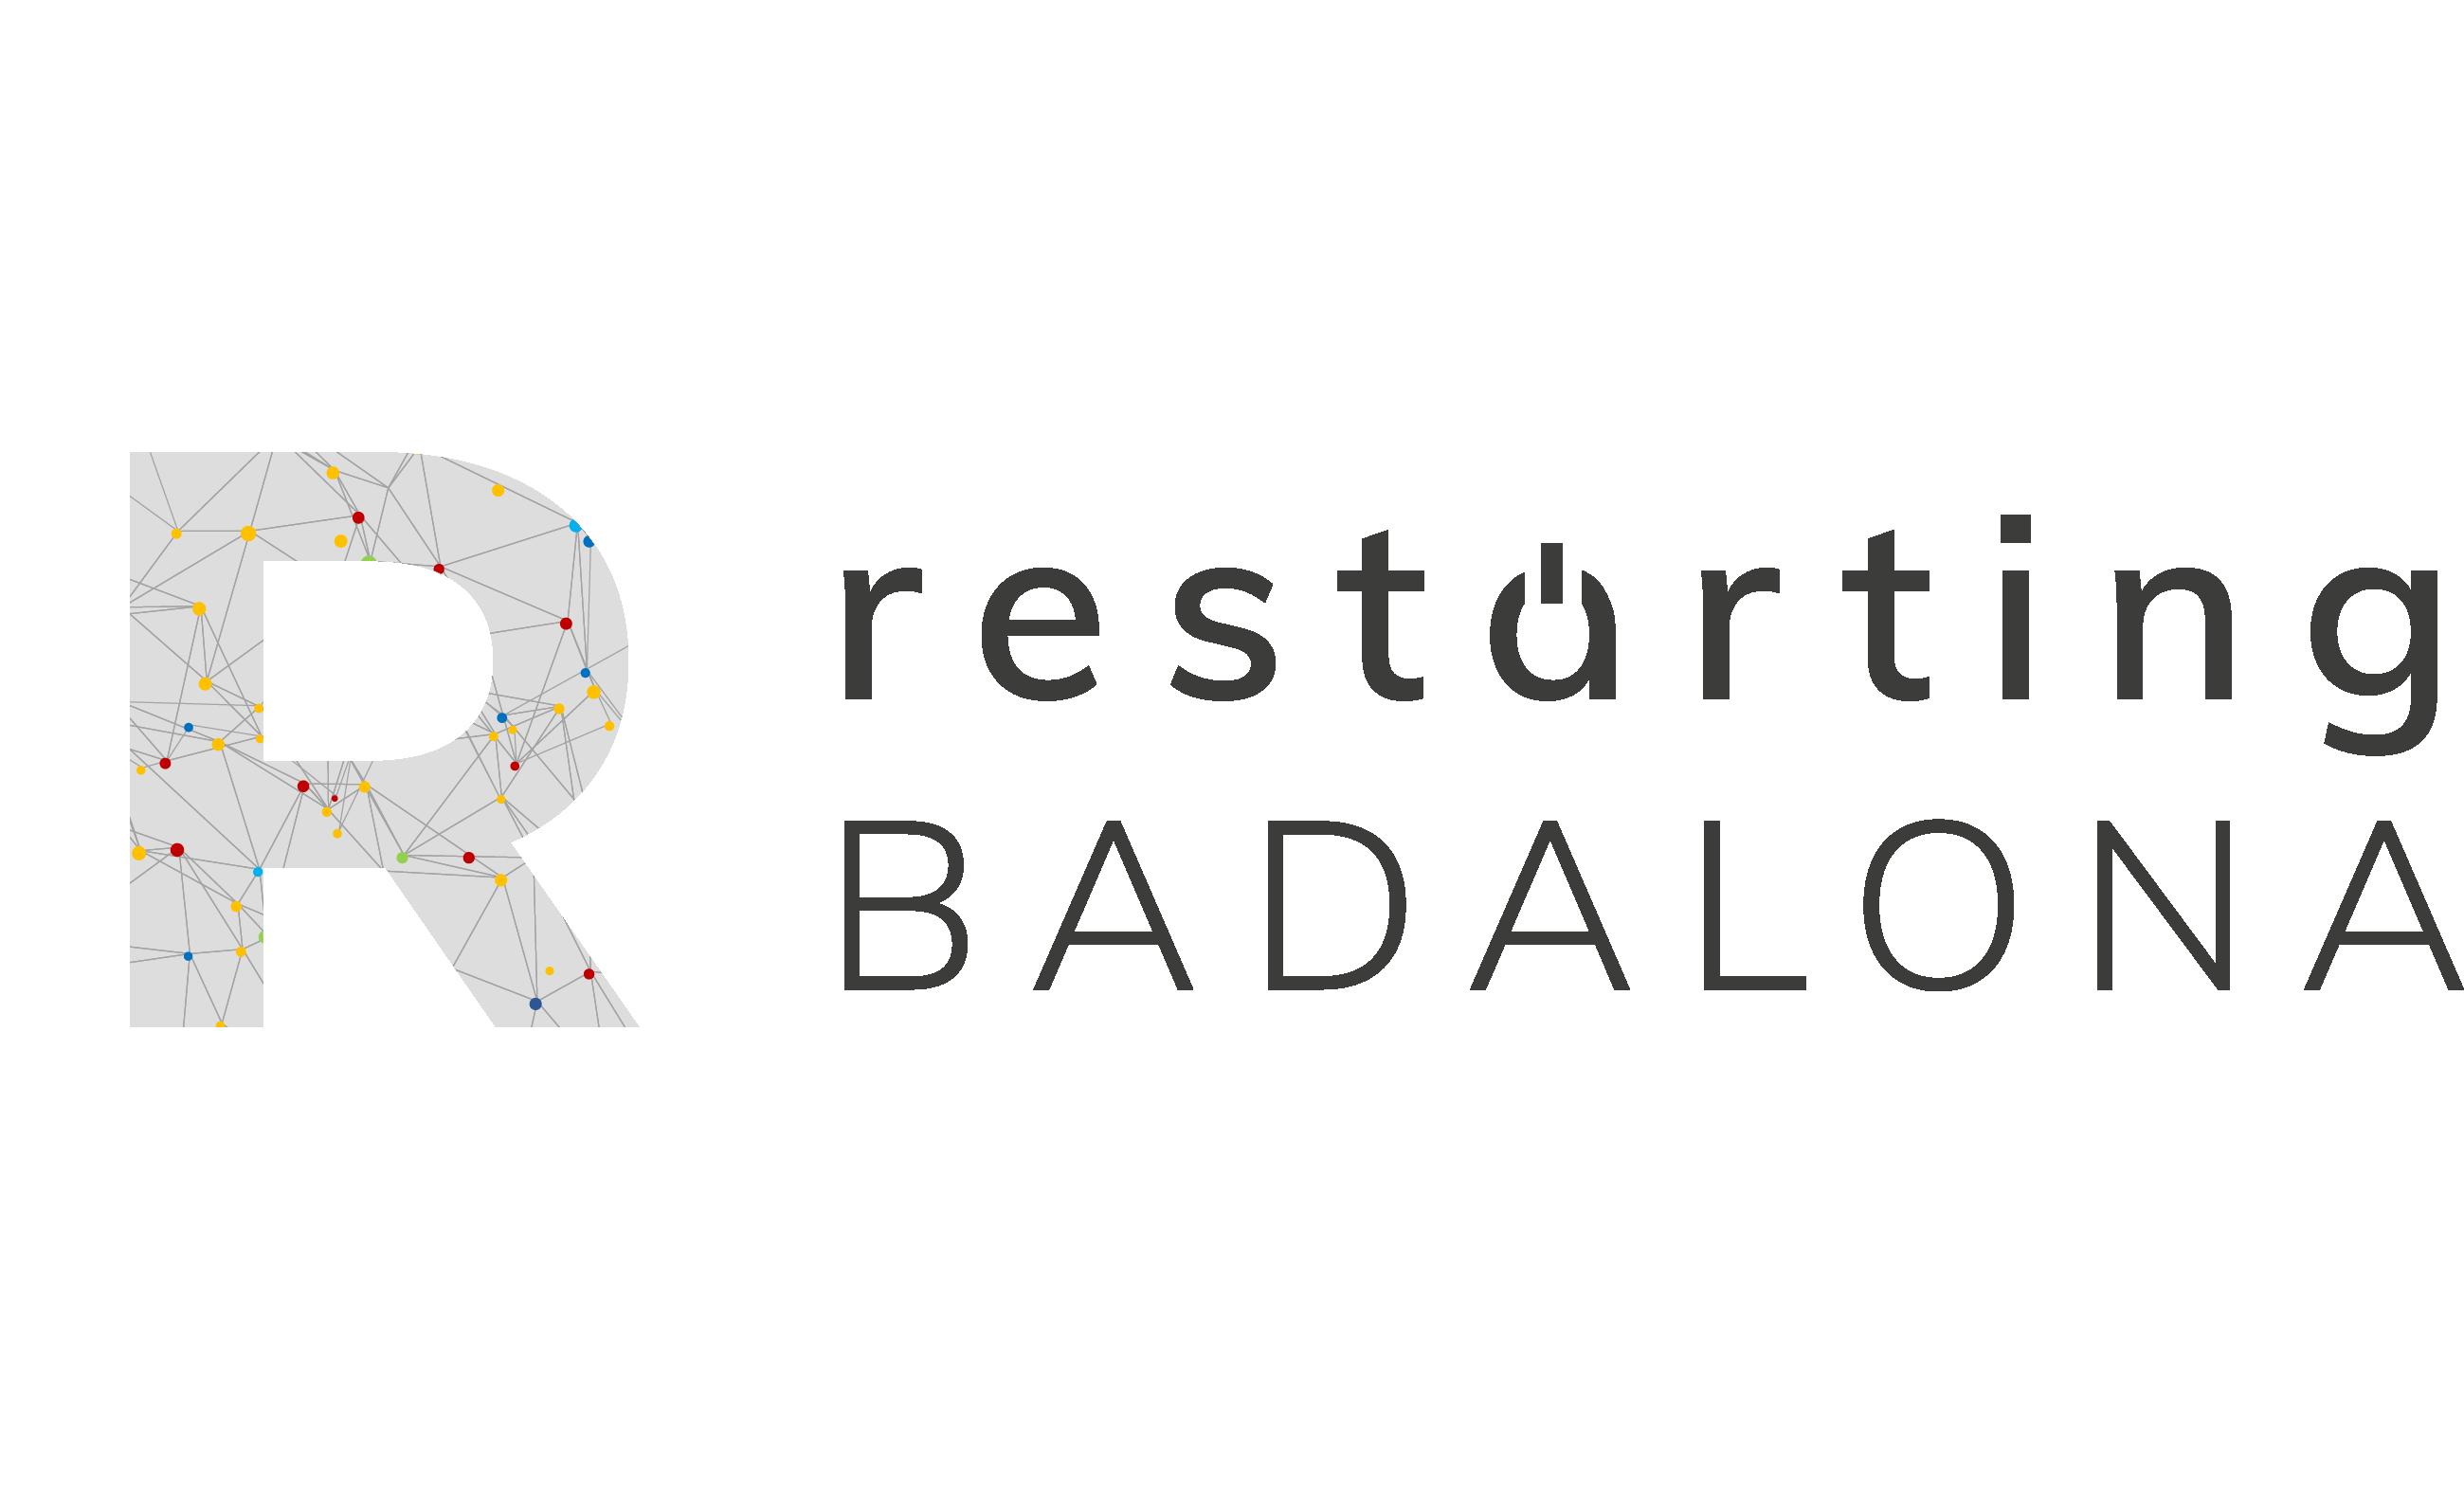 Restarting Badalona